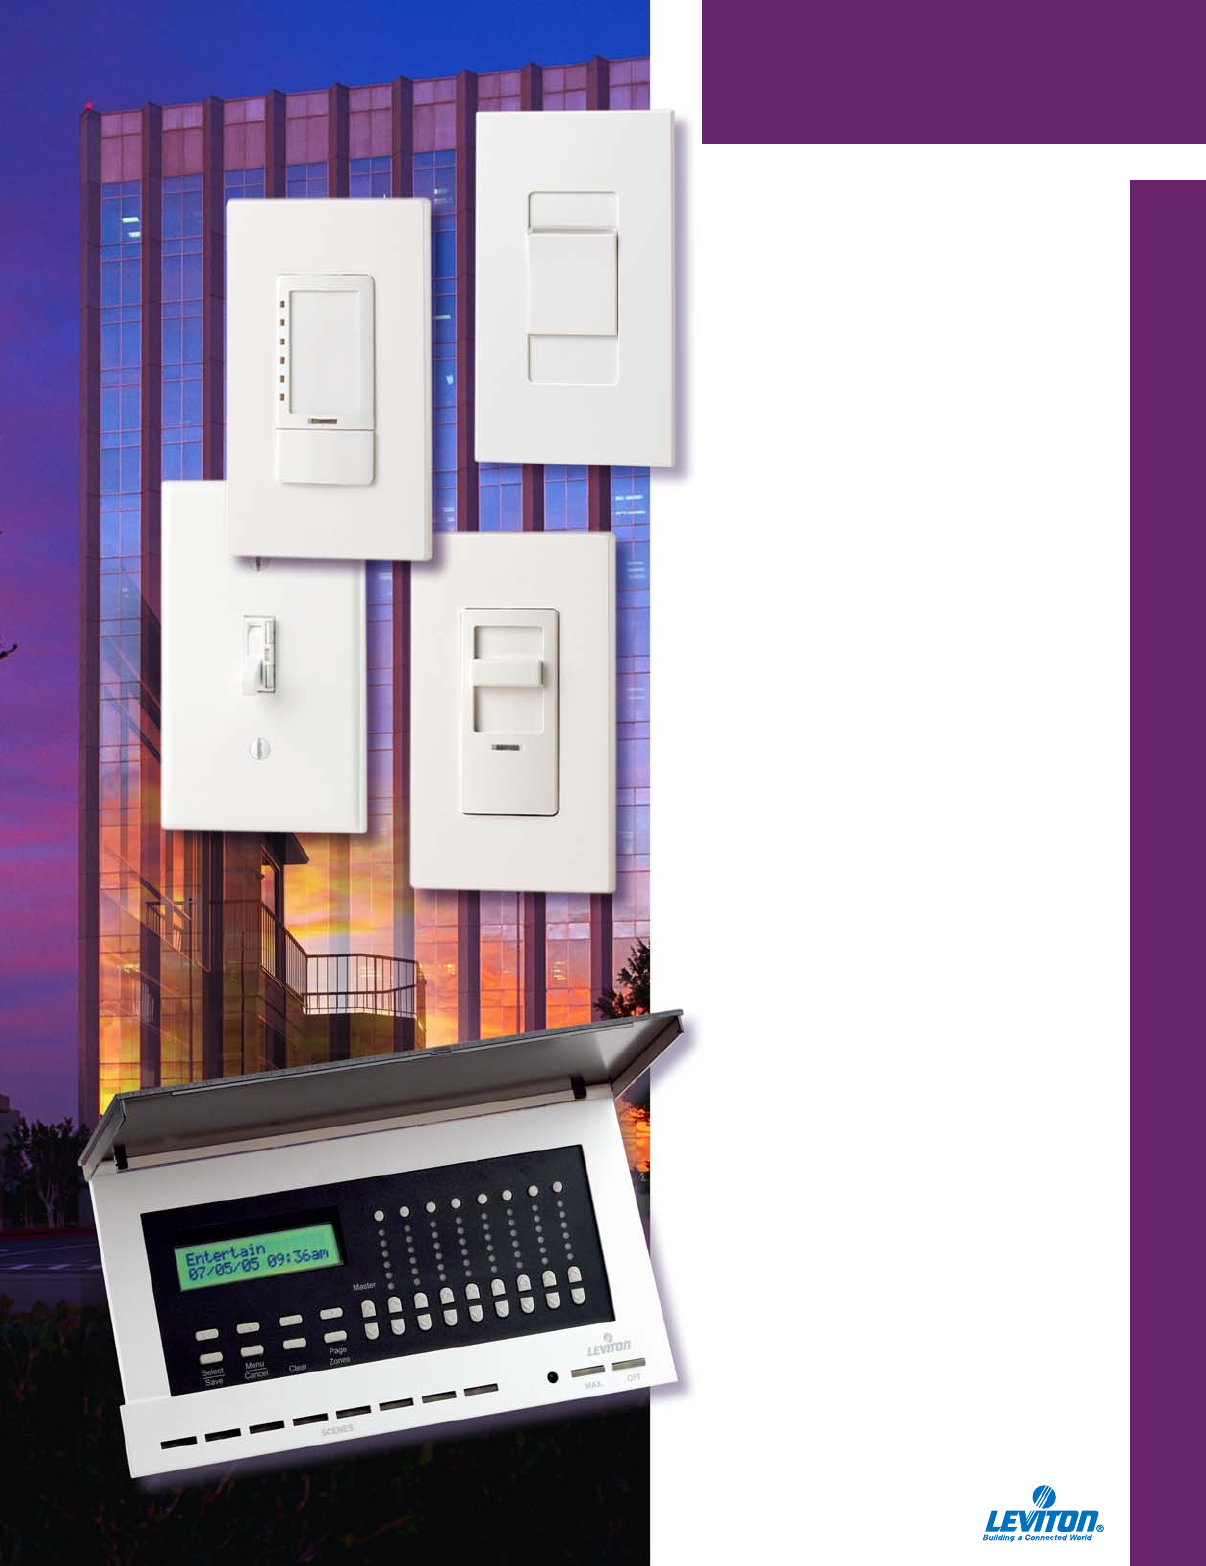 Leviton MNF07-1LE Digital Preset High End Commercial Fan Slide Speed Control